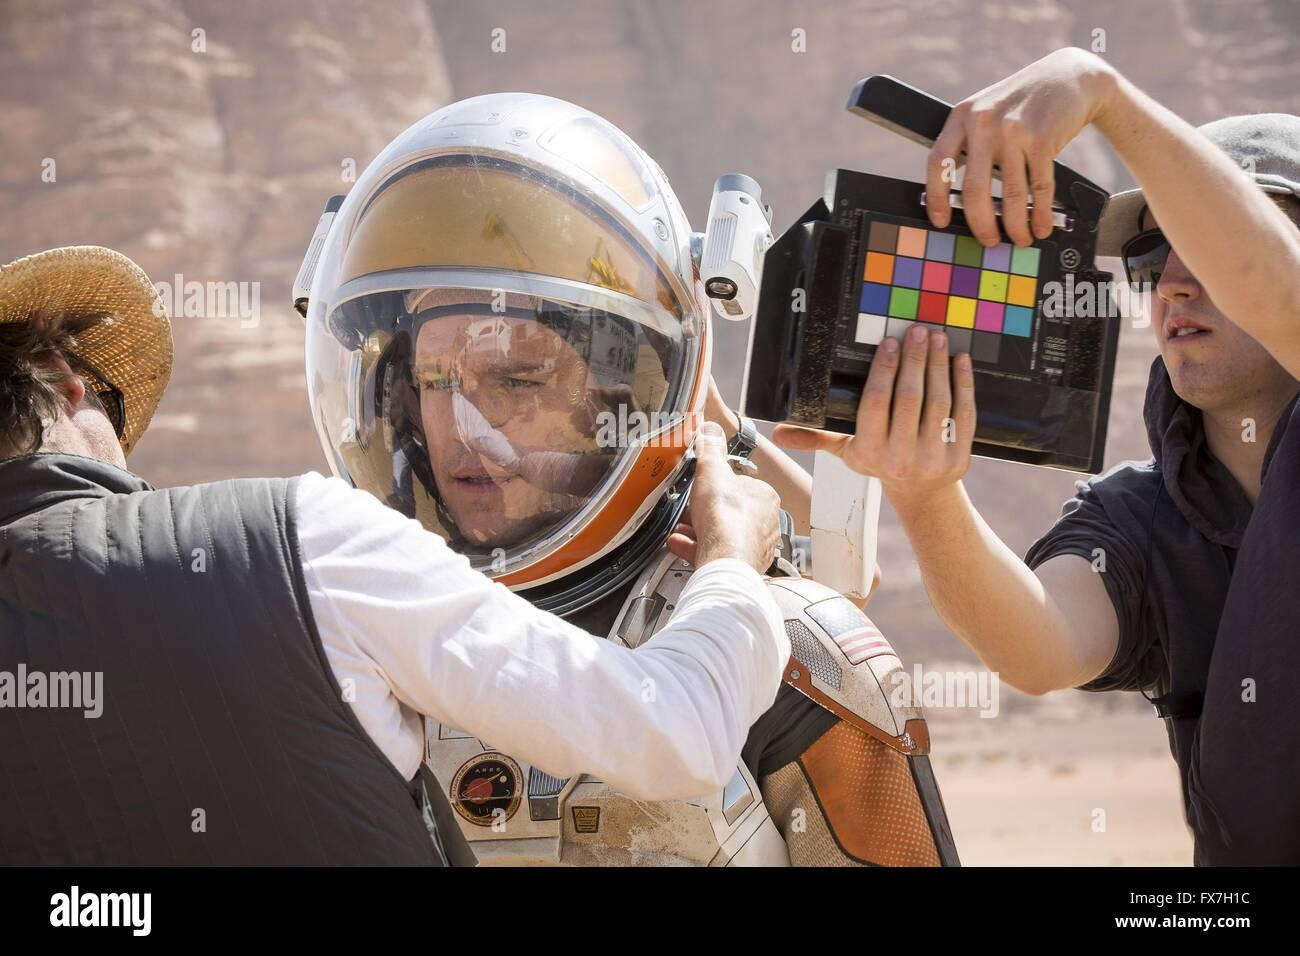 The Martian Year : 2015 USA Director : Ridley Scott Matt Damon Shooting picture - Stock Image